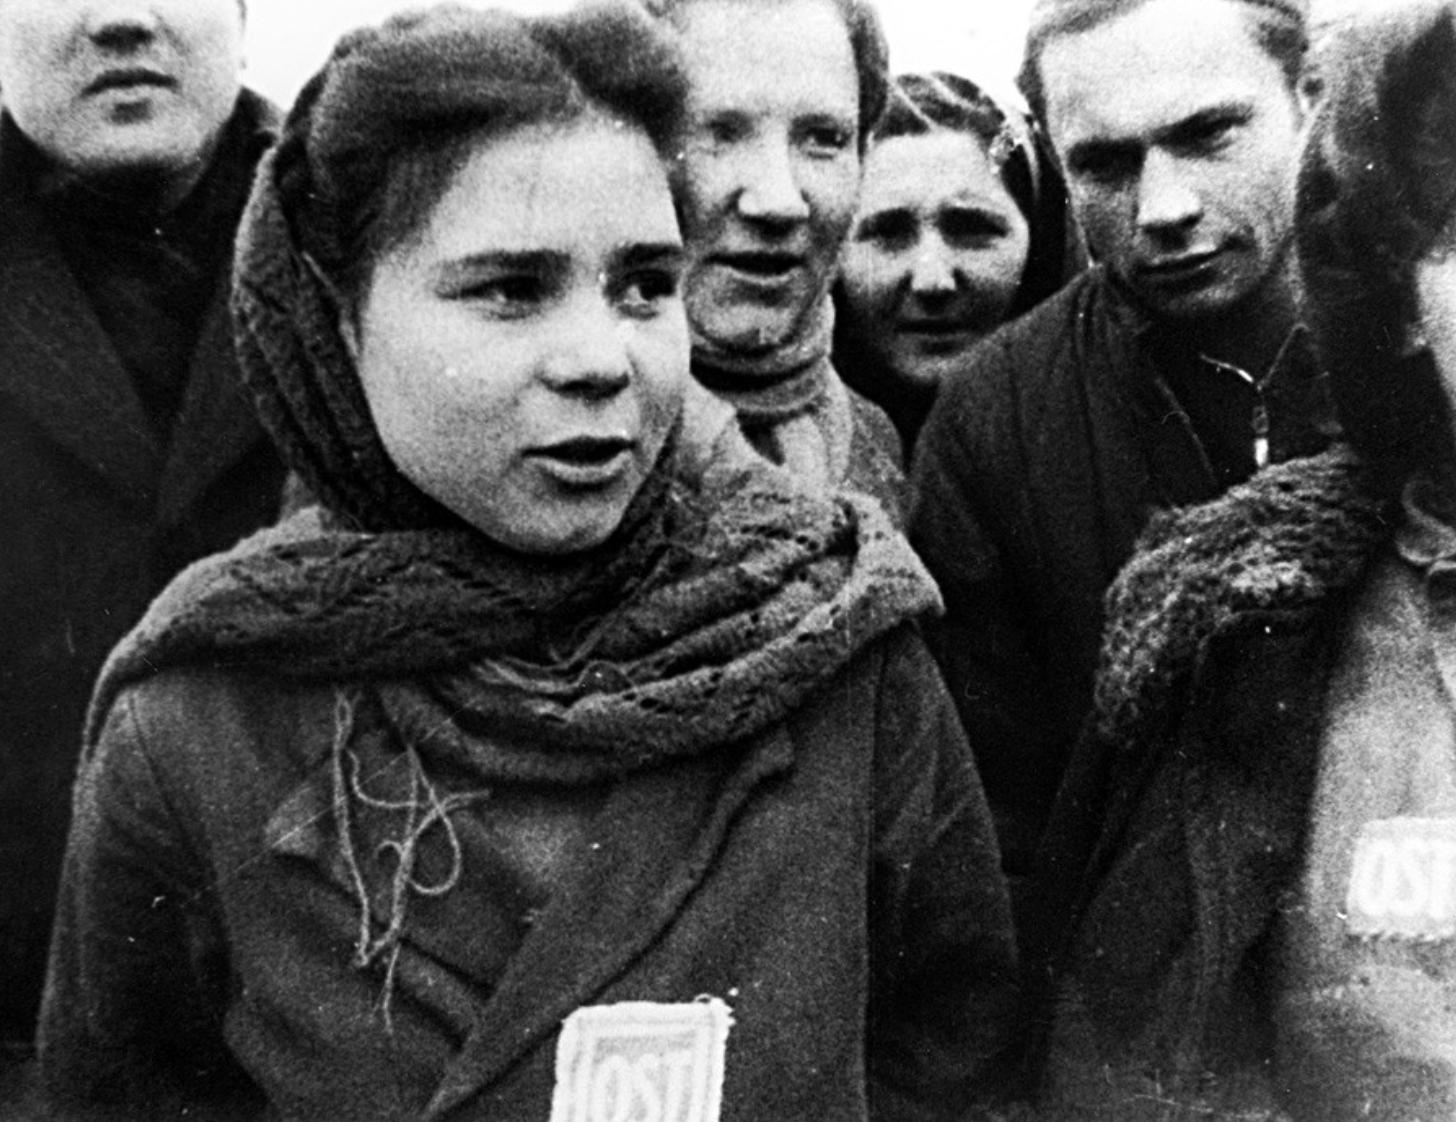 Des femmes soviétiques en Allemagne nazie